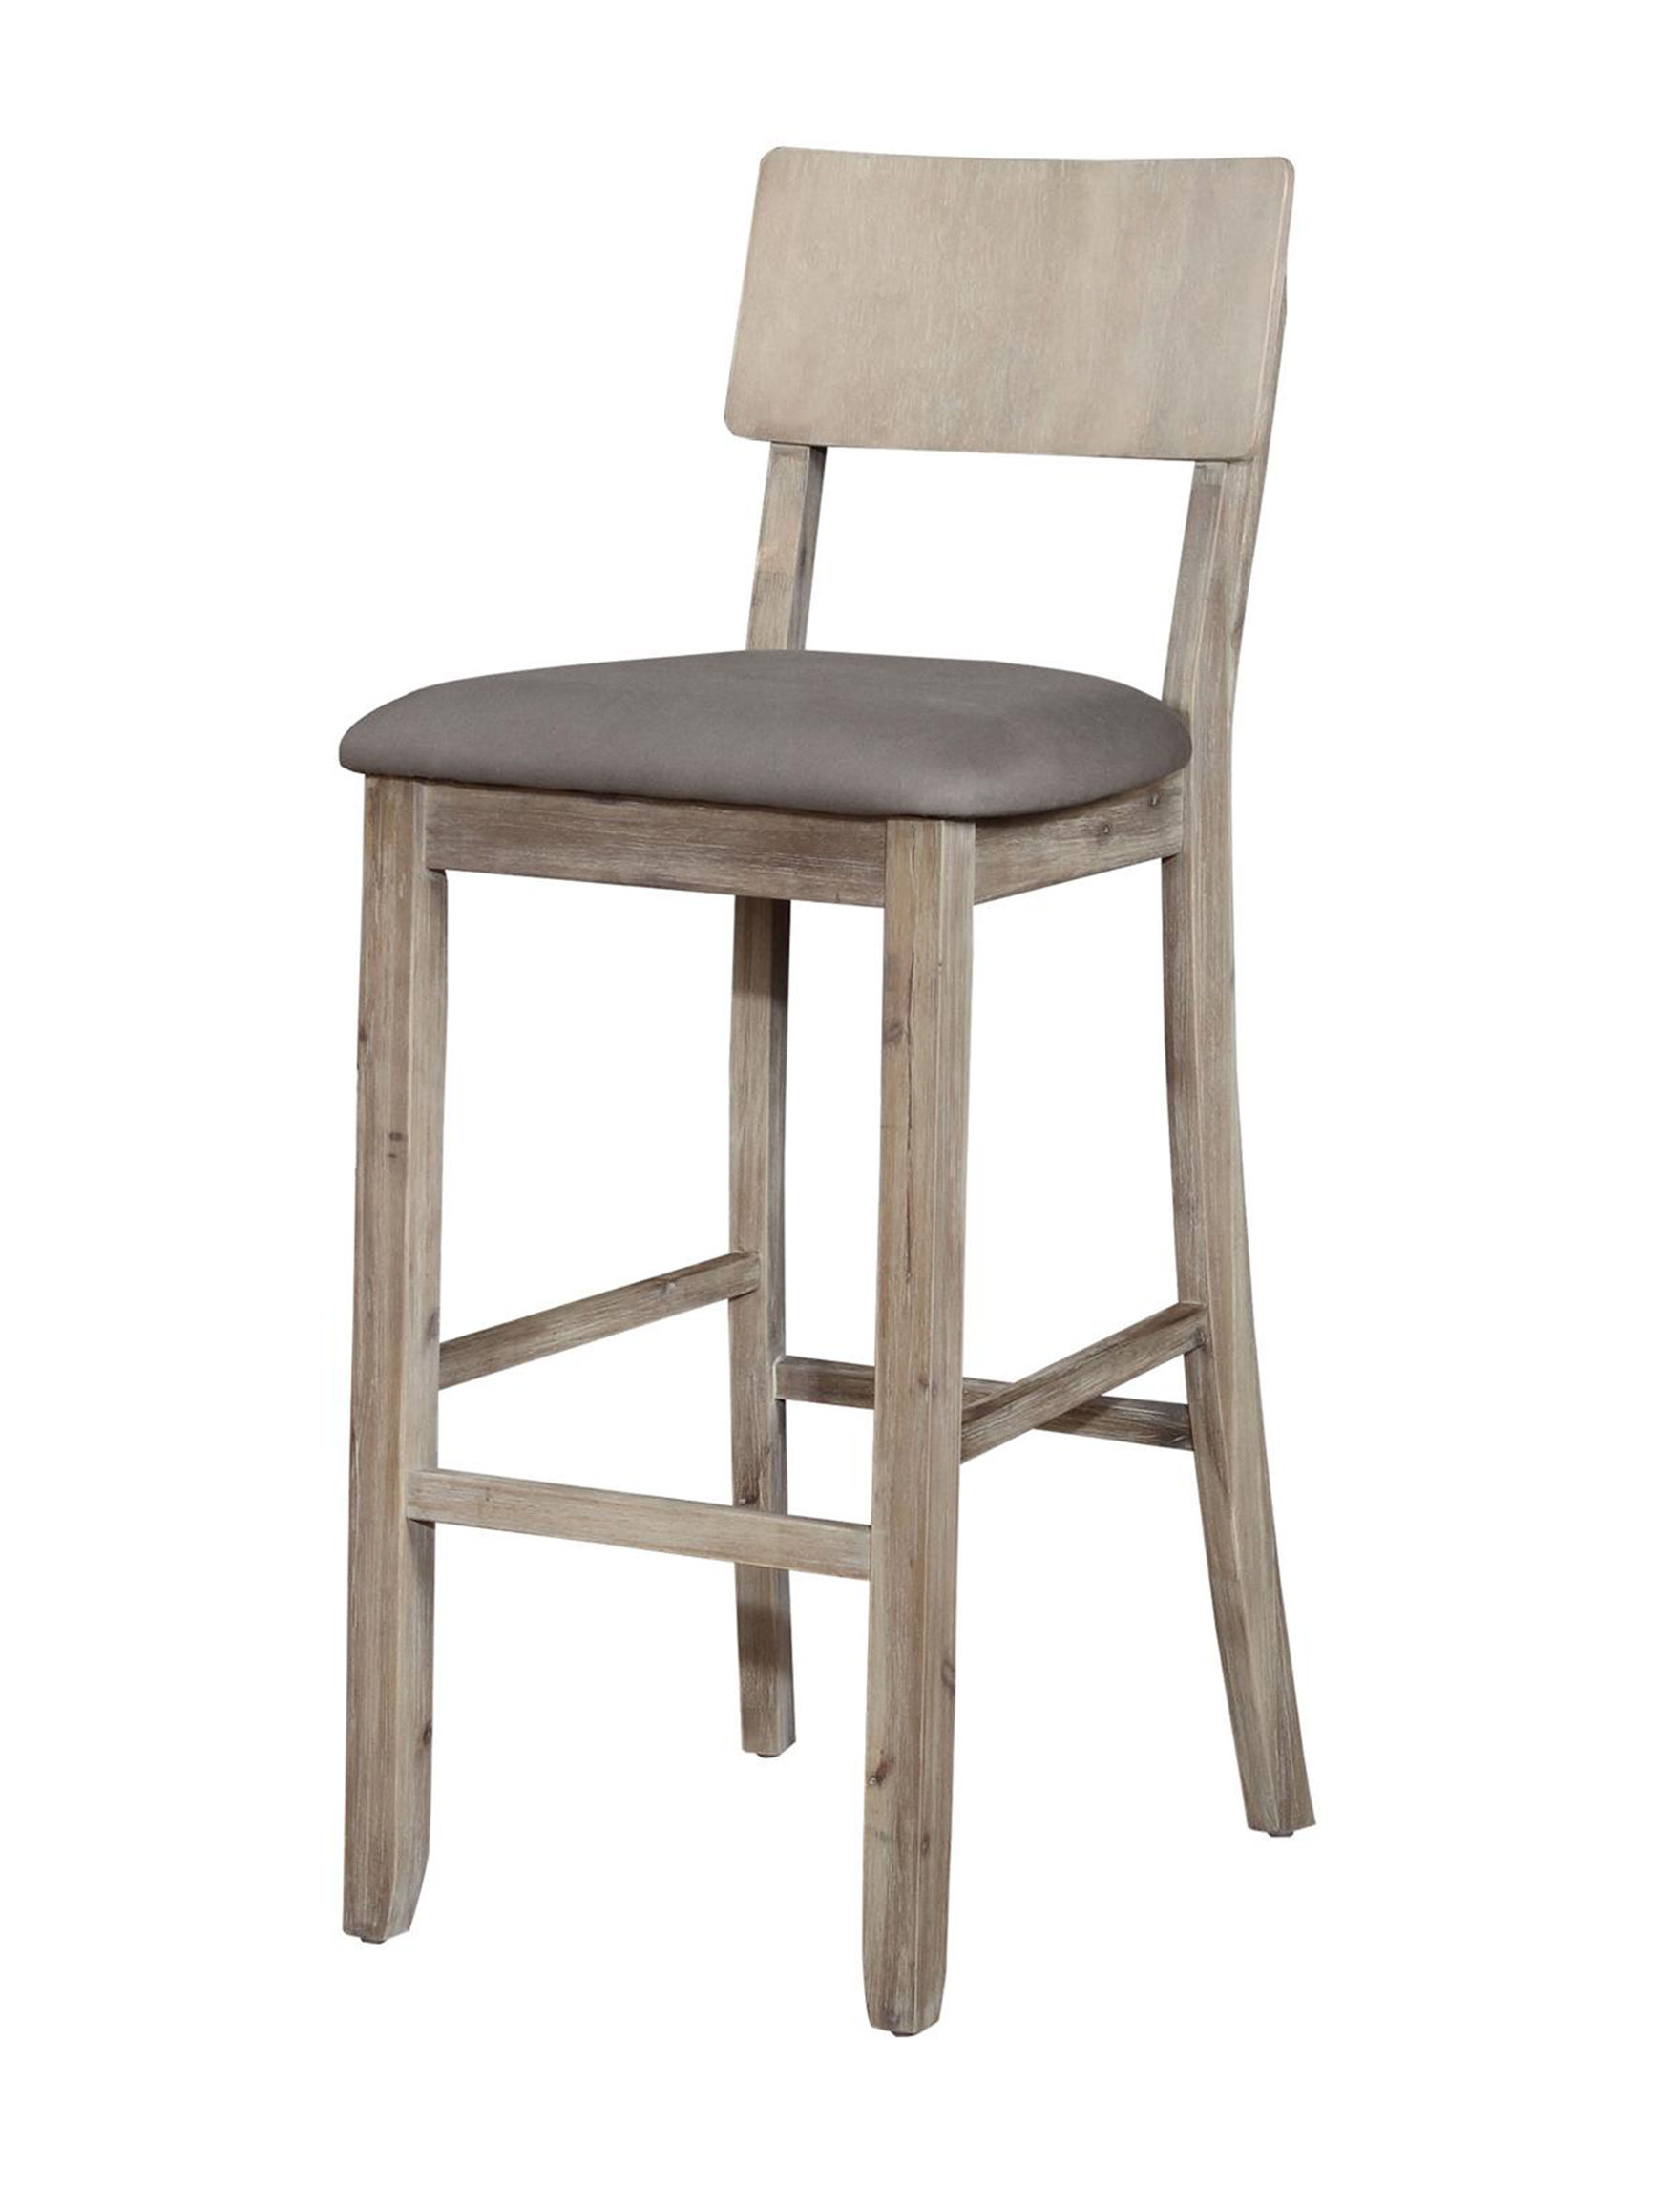 Linon Gray Bar & Kitchen Stools Kitchen & Dining Furniture